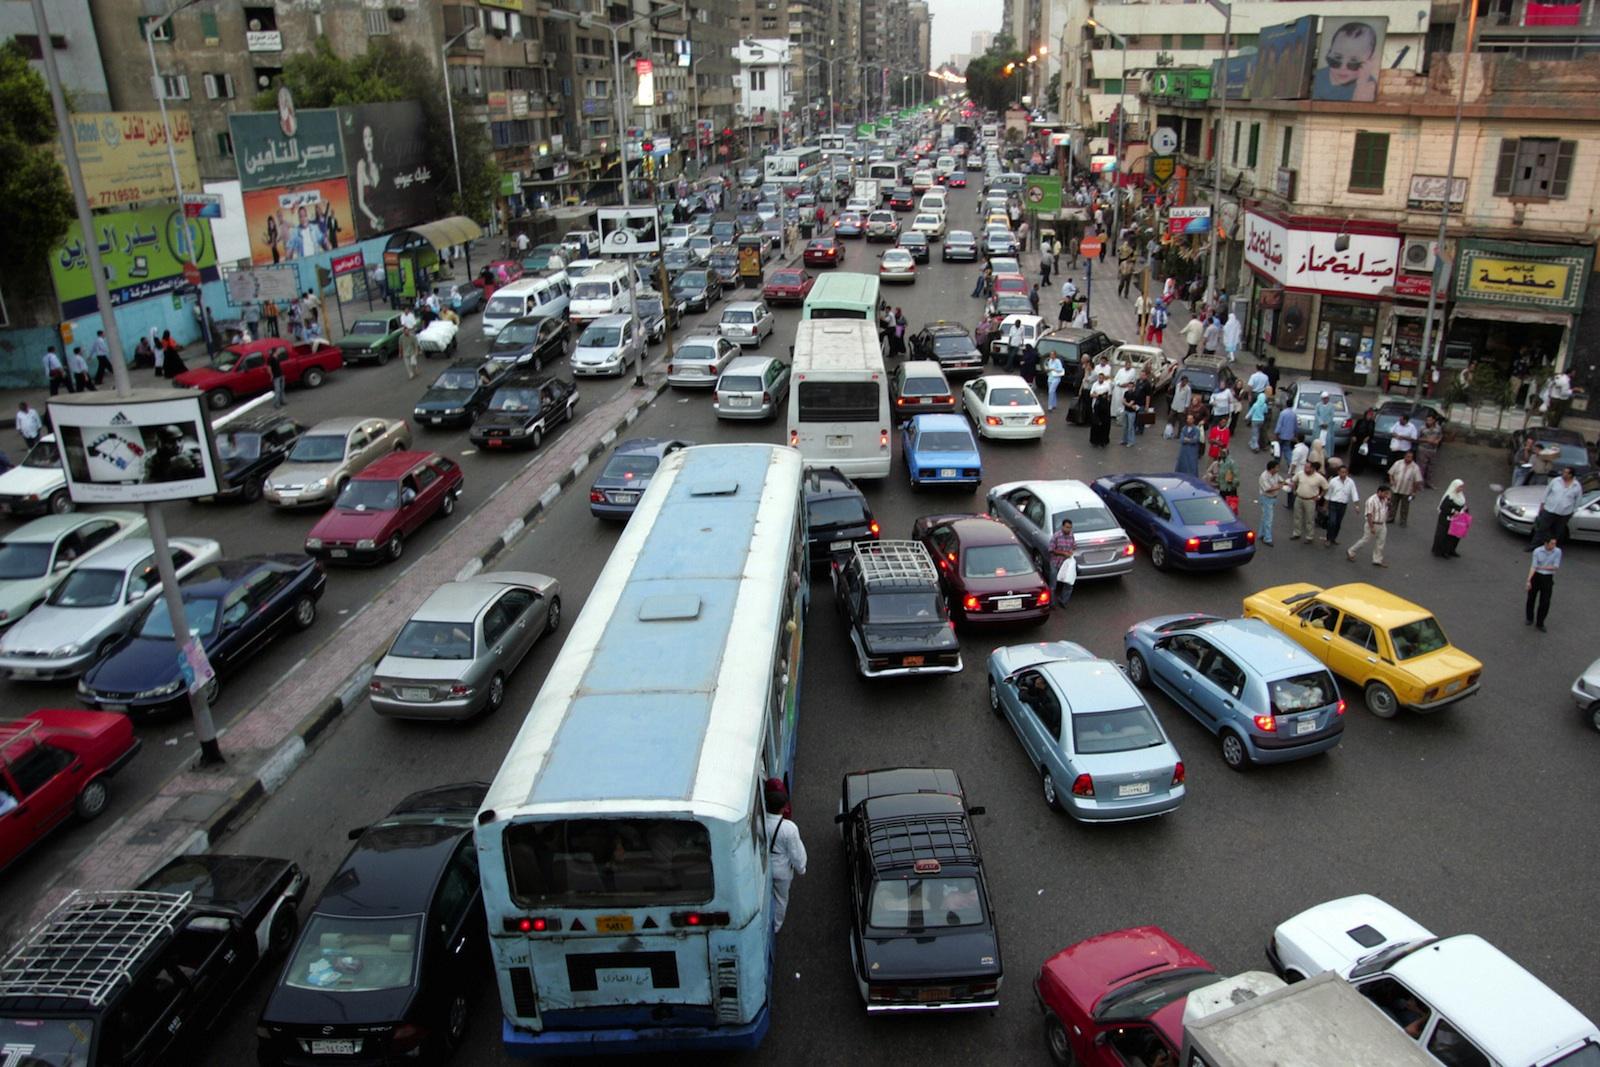 Cairo's Public Transportation Scene: A Ticking Bomb